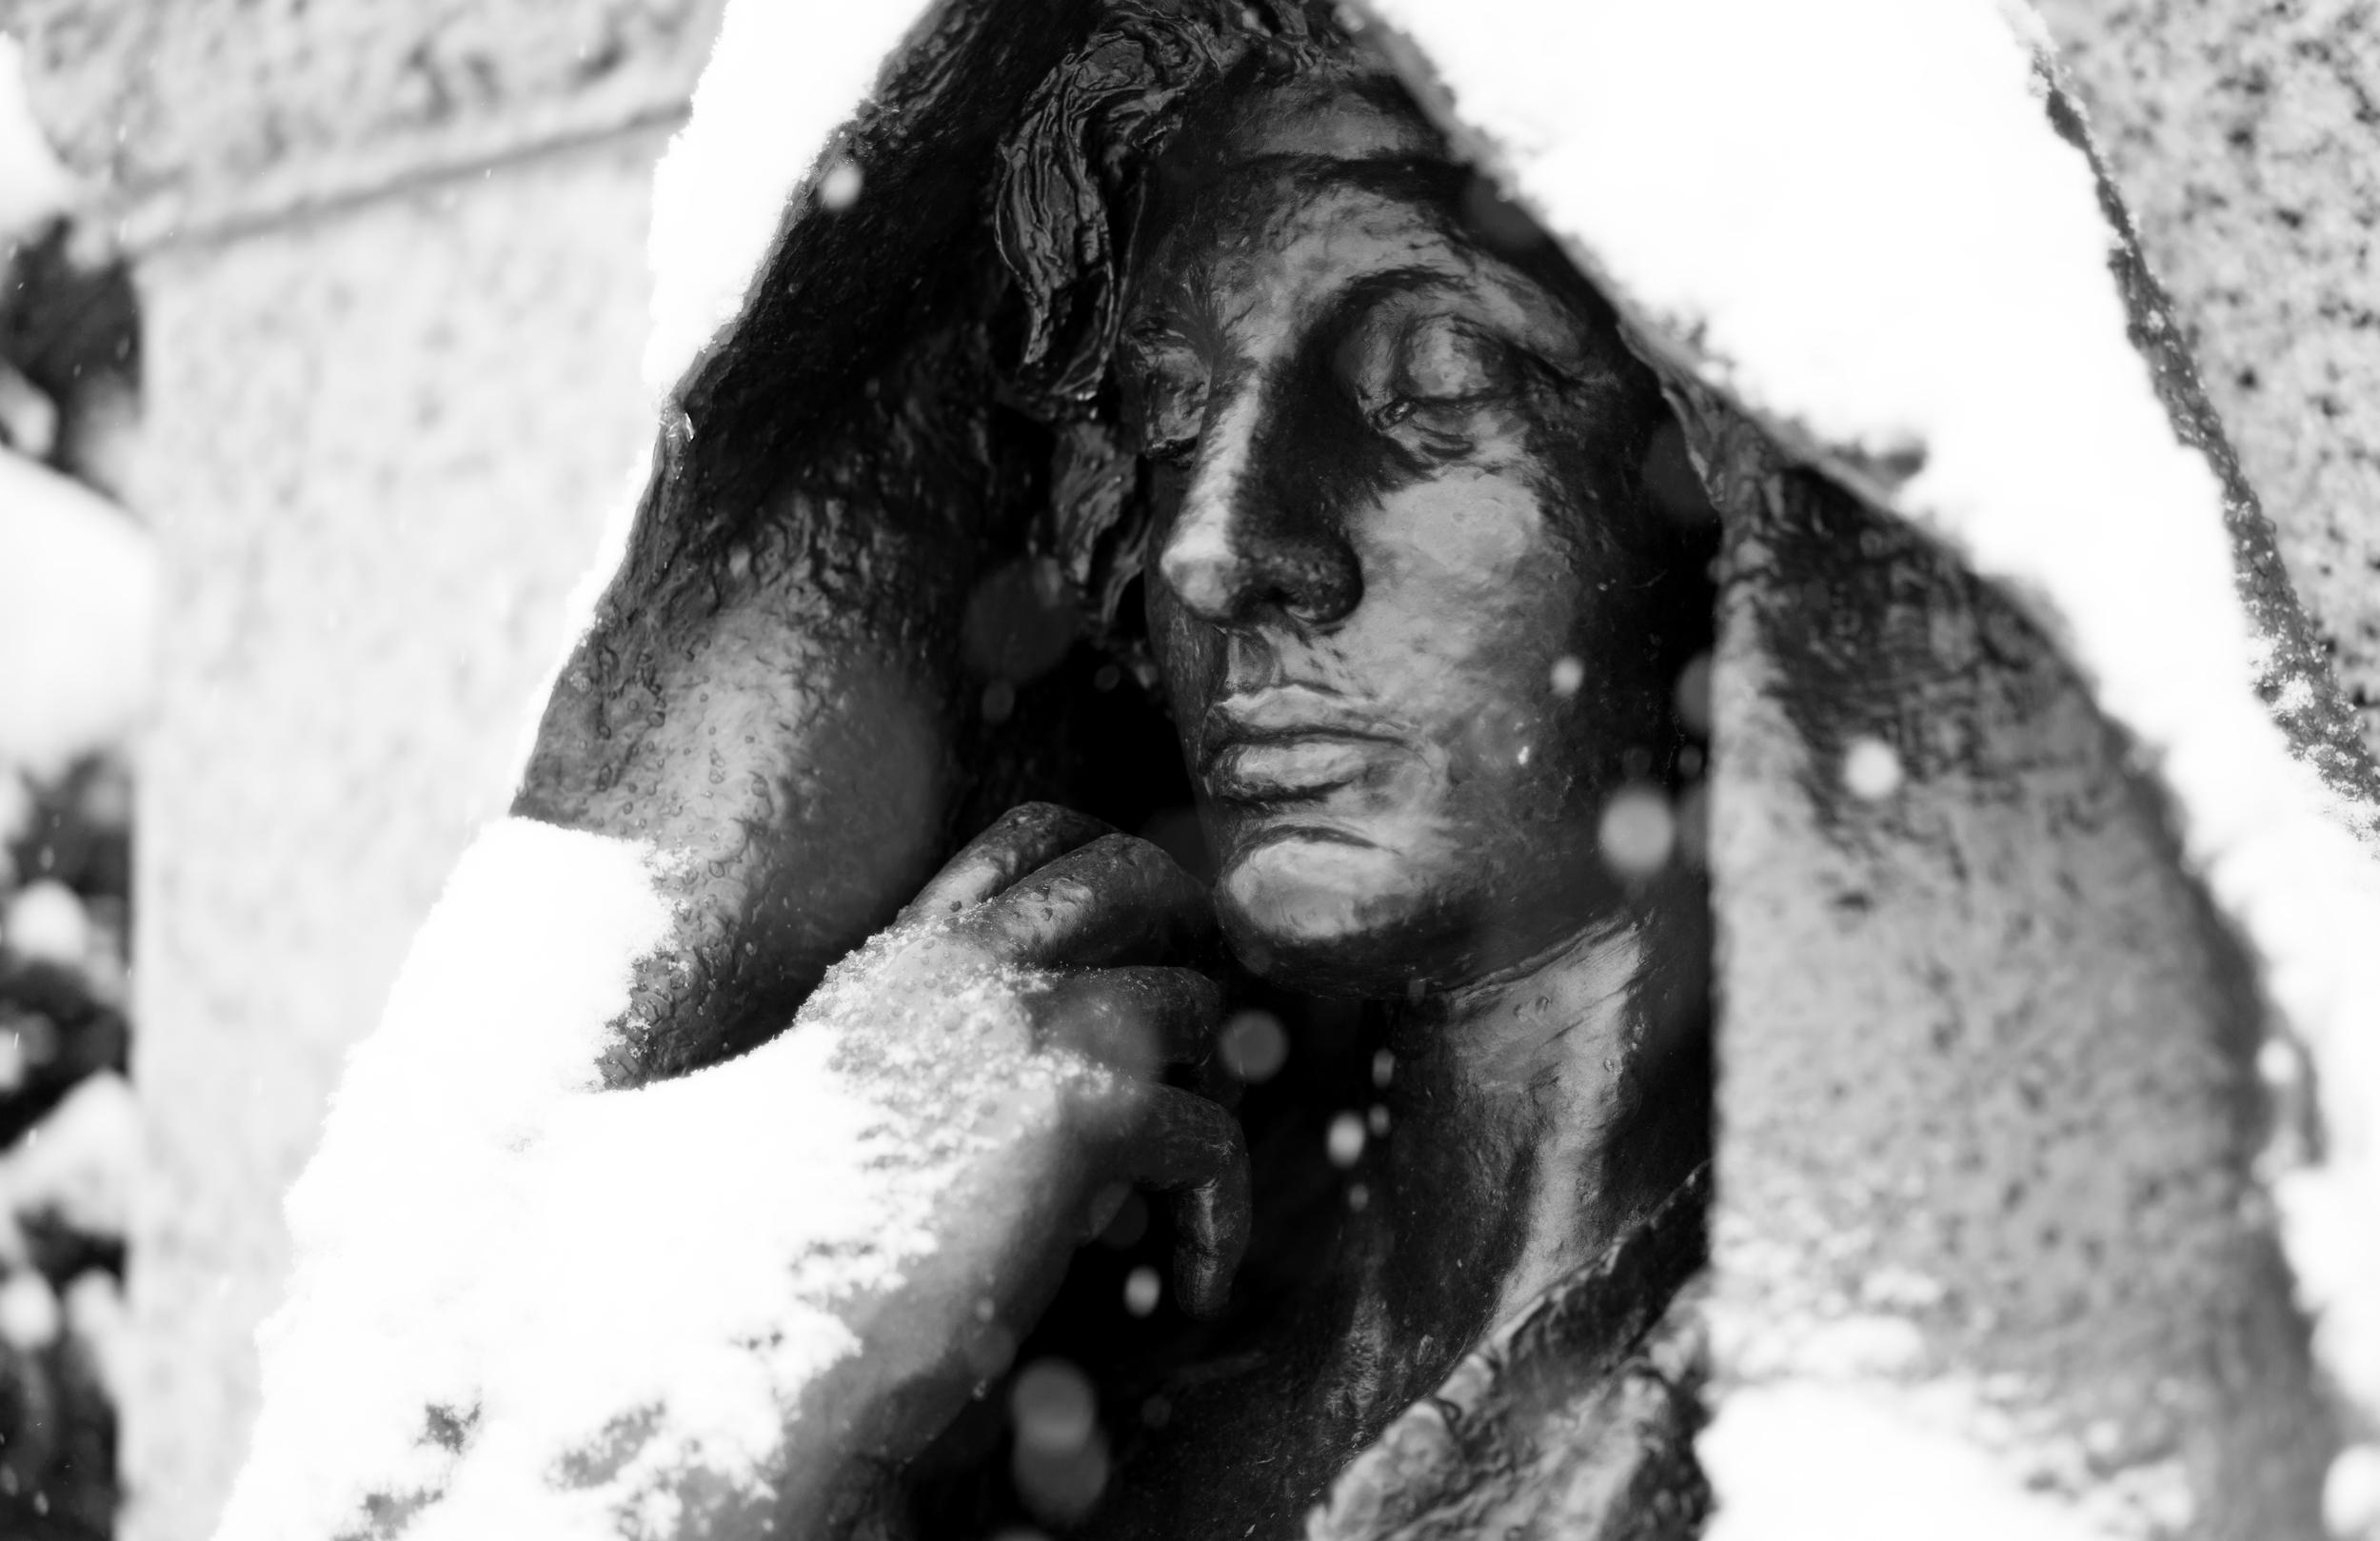 Grief  by Augustus Saint-Gaudens at the cemetery's Adams Memorial.